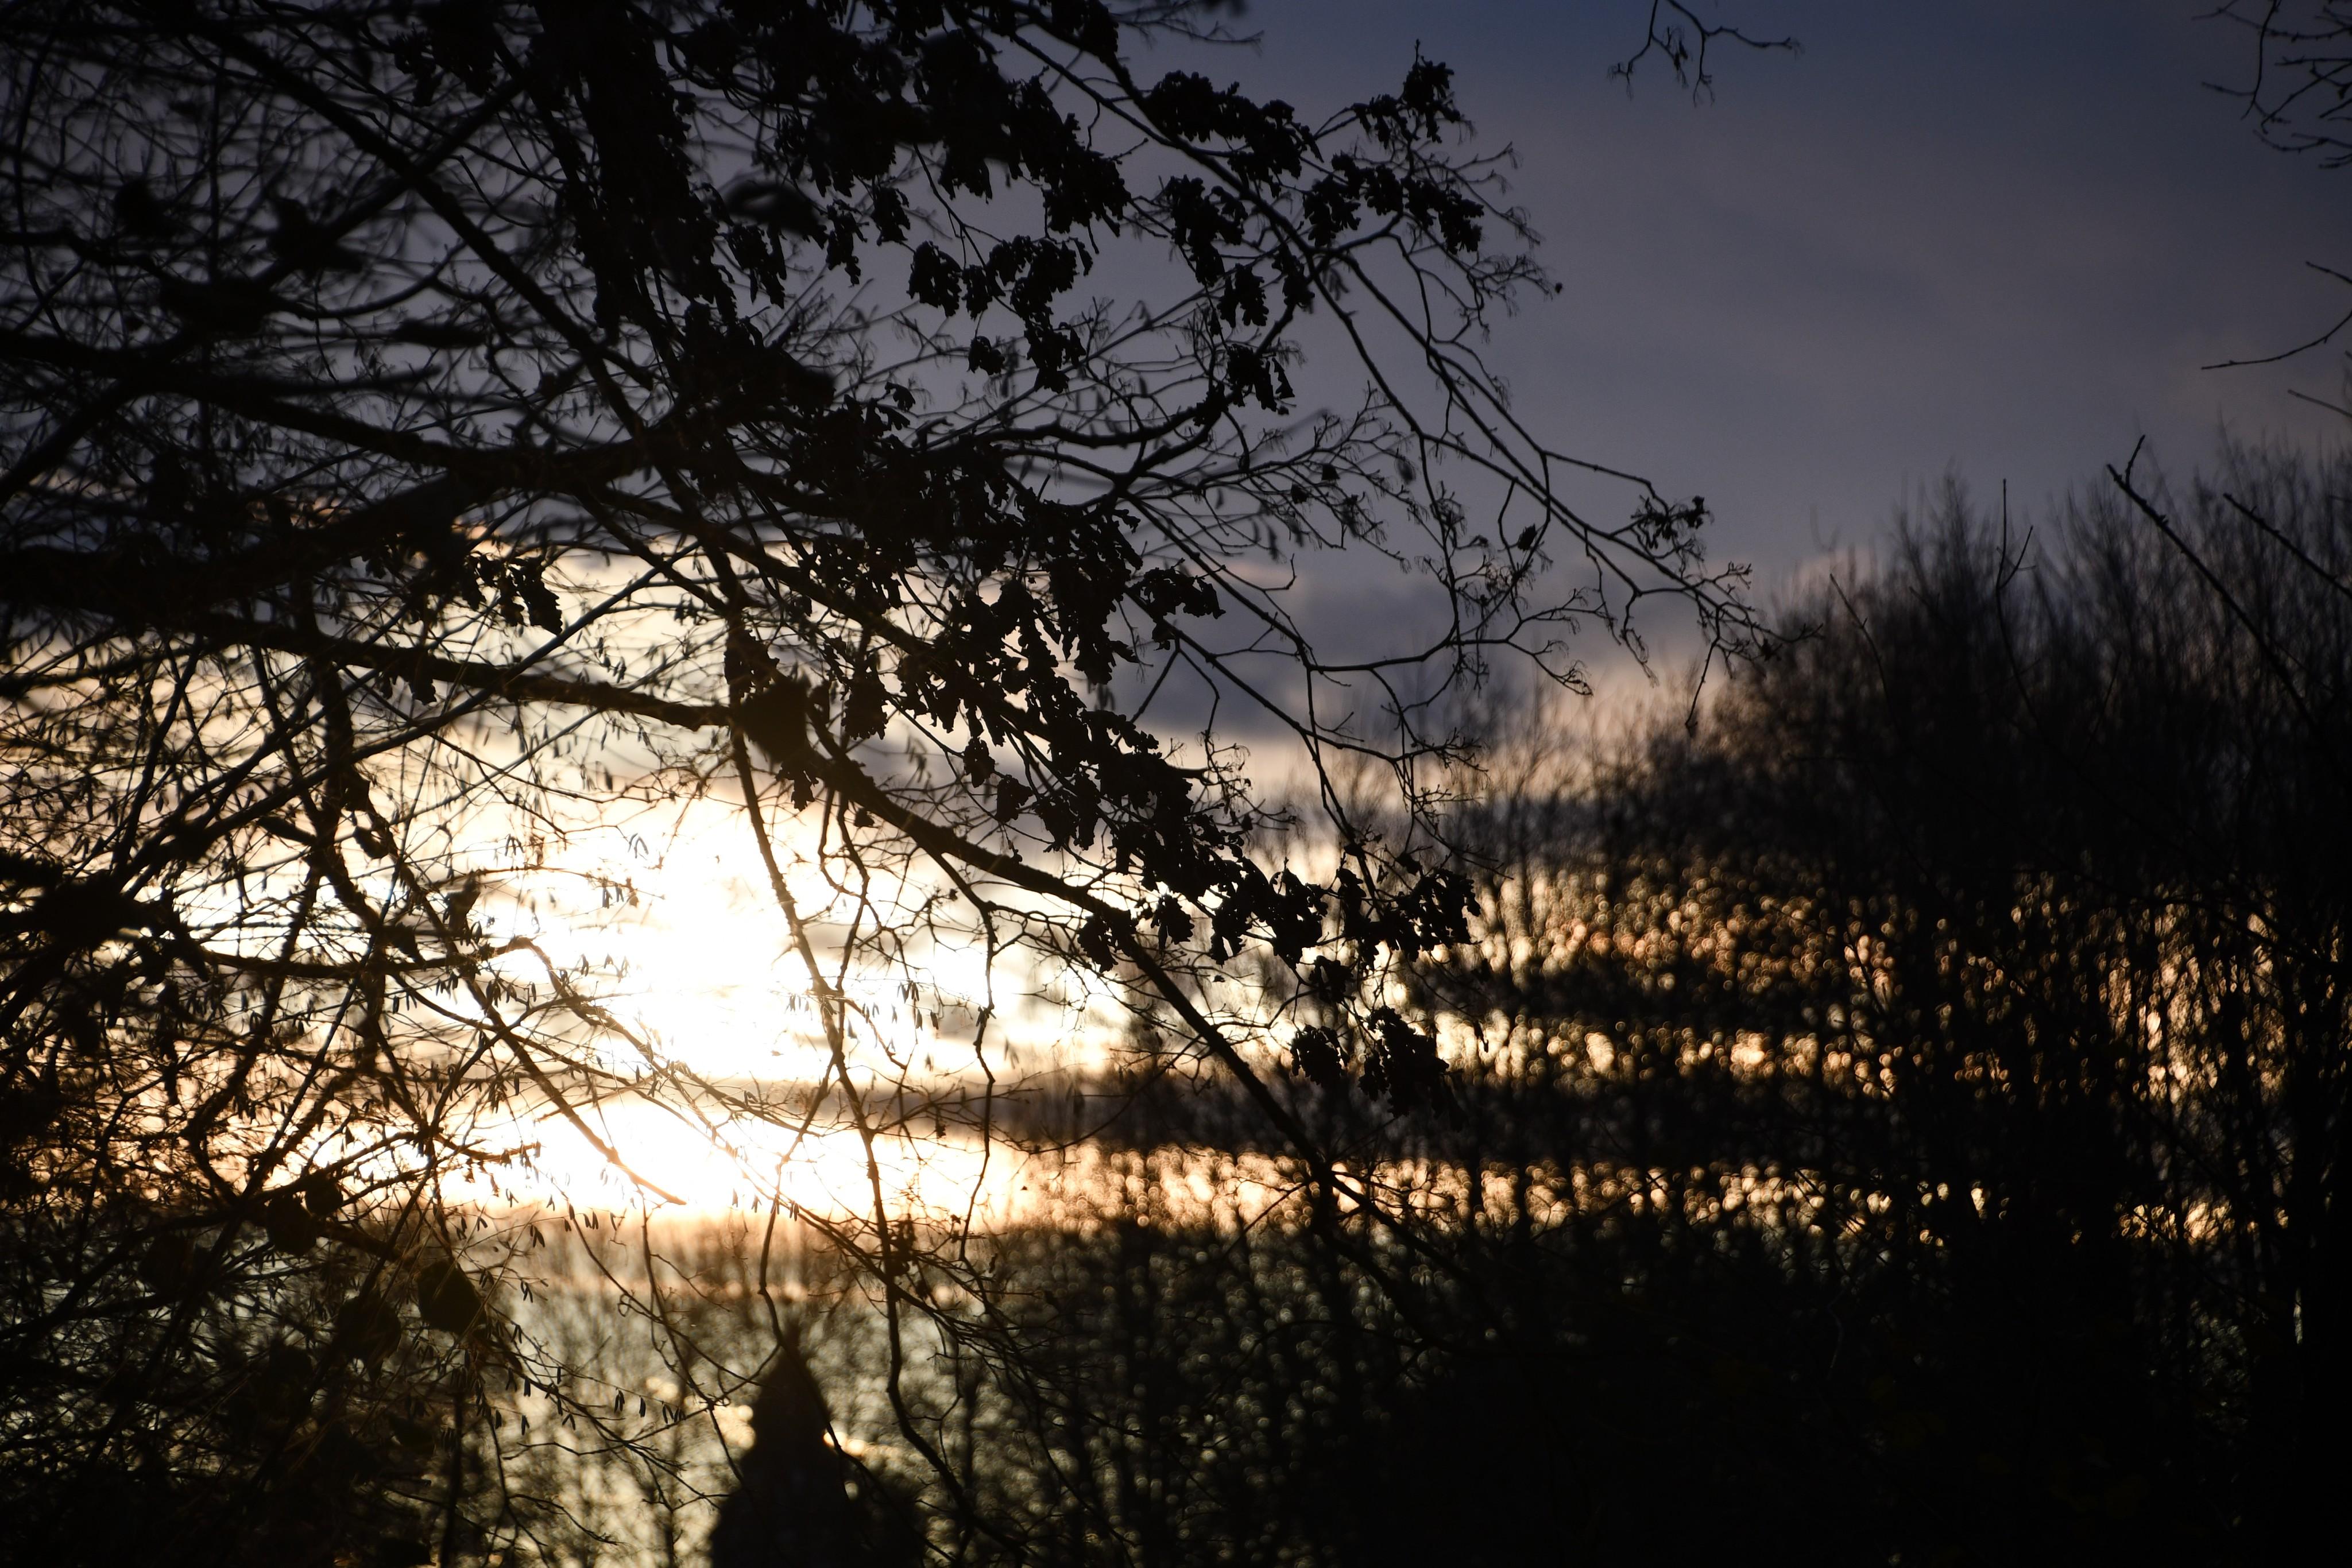 sunset-07.12-1